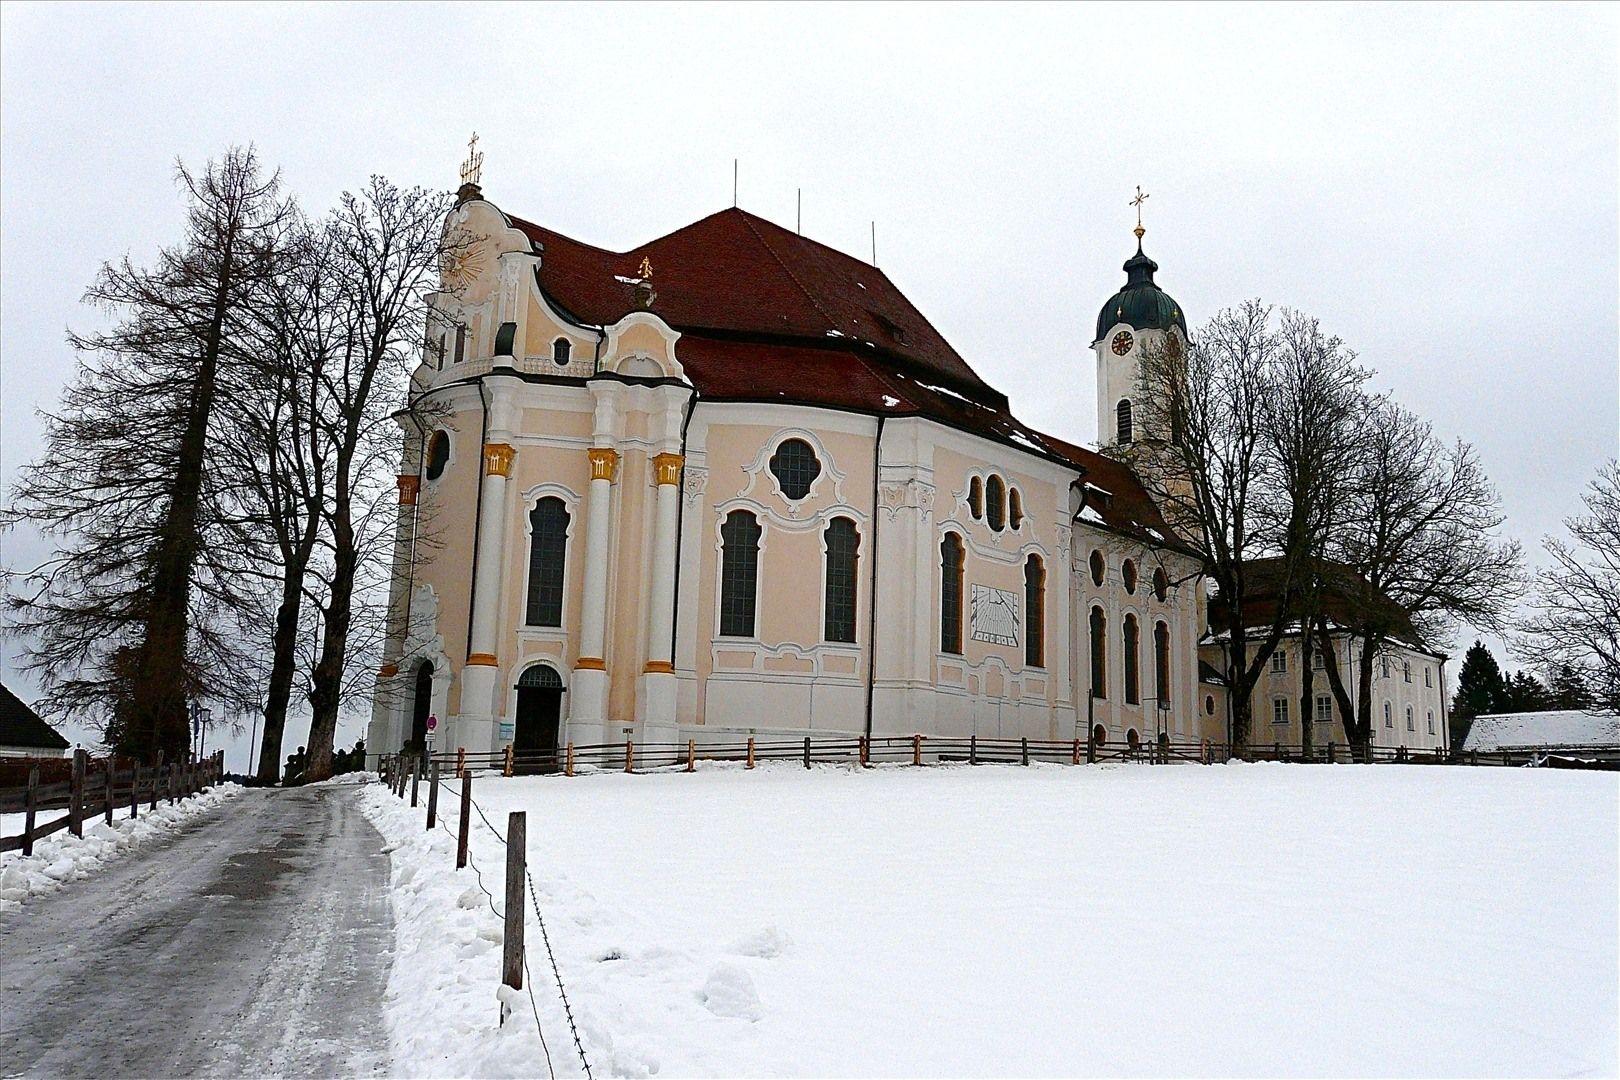 The_Wies_-_Bavaria_-_Germany.jpg (1620×1080)